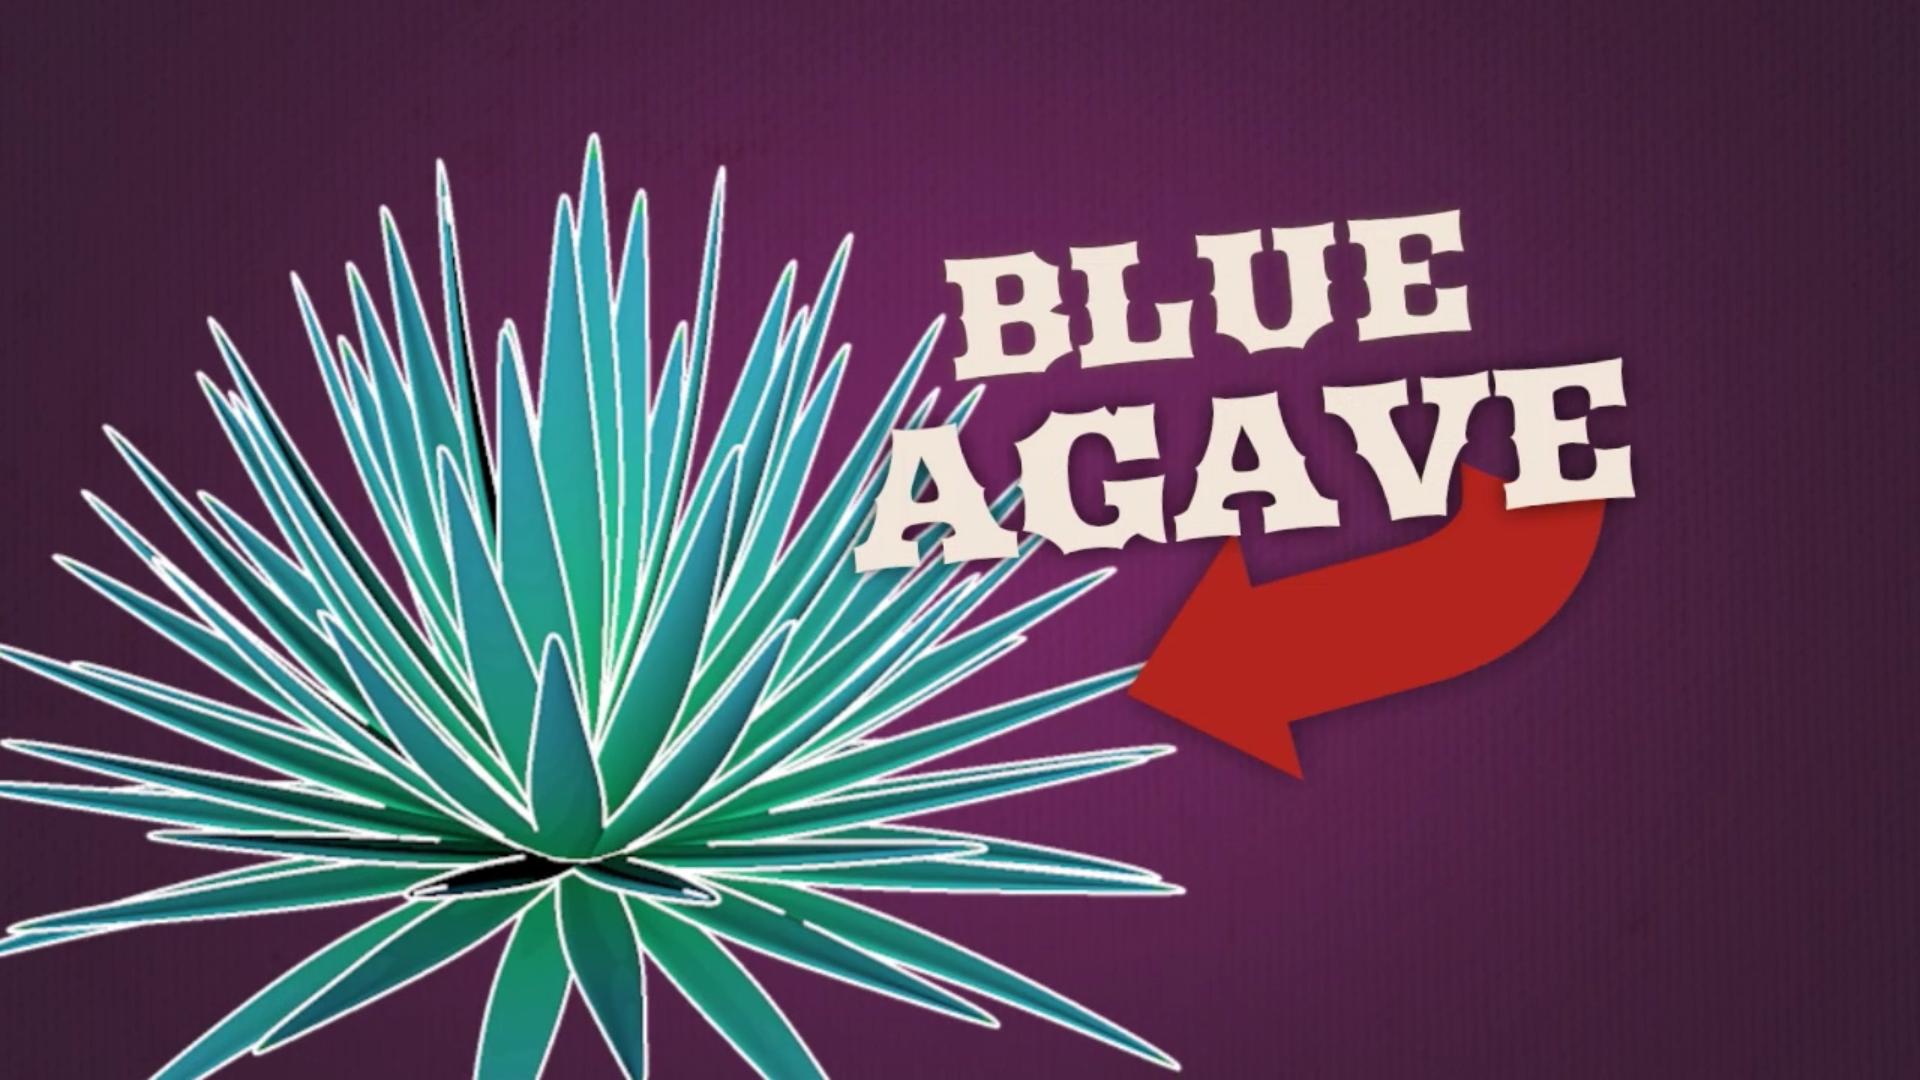 Tumbleweed Agave TV